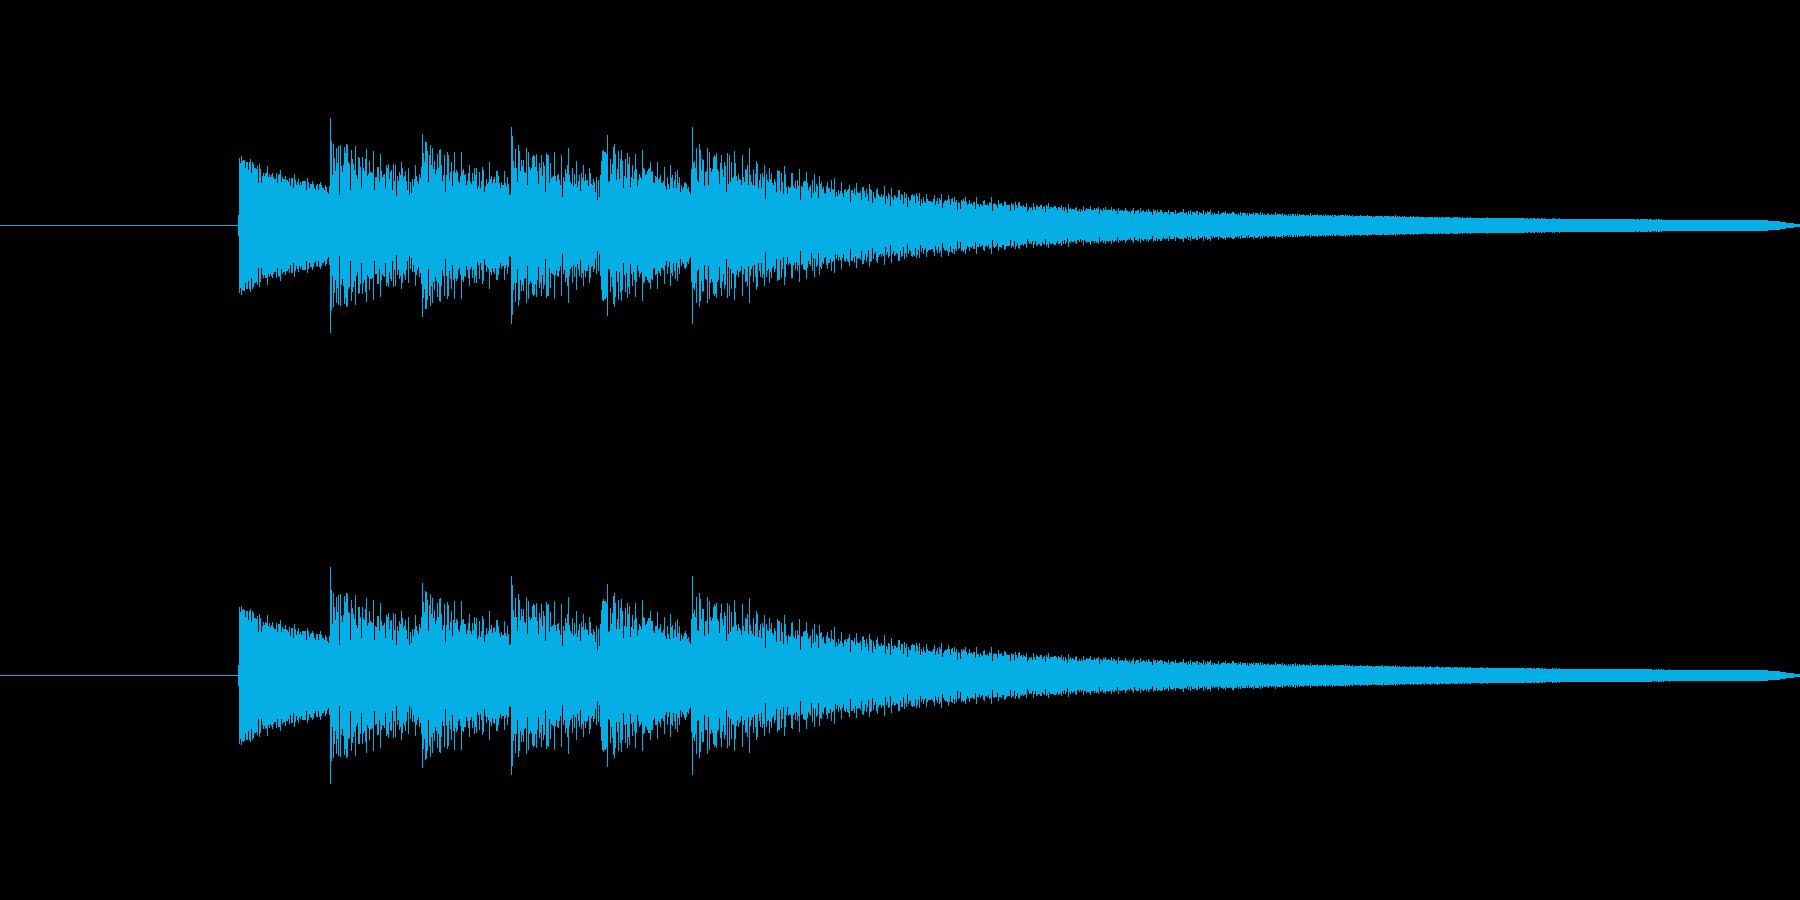 ピンポン、ピンポン、ピンポン、という音の再生済みの波形